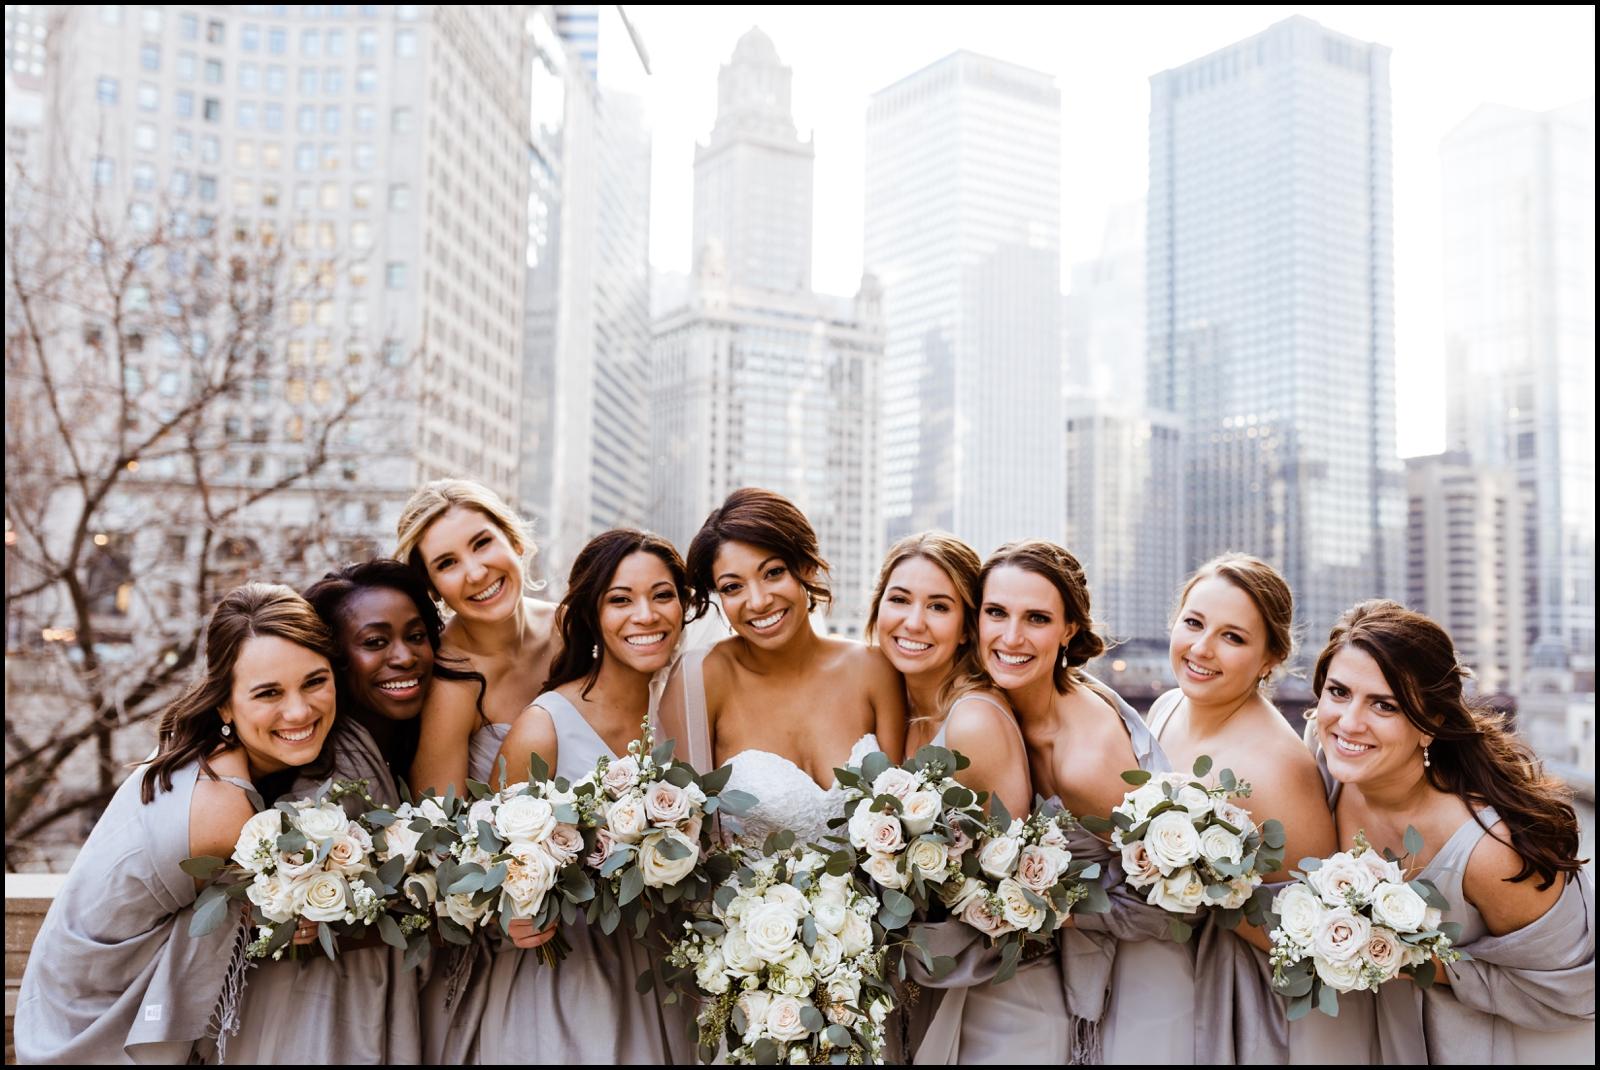 Chicago Wedding- Alice Millar Chapel Ceremony, London House Reception_0088.jpg